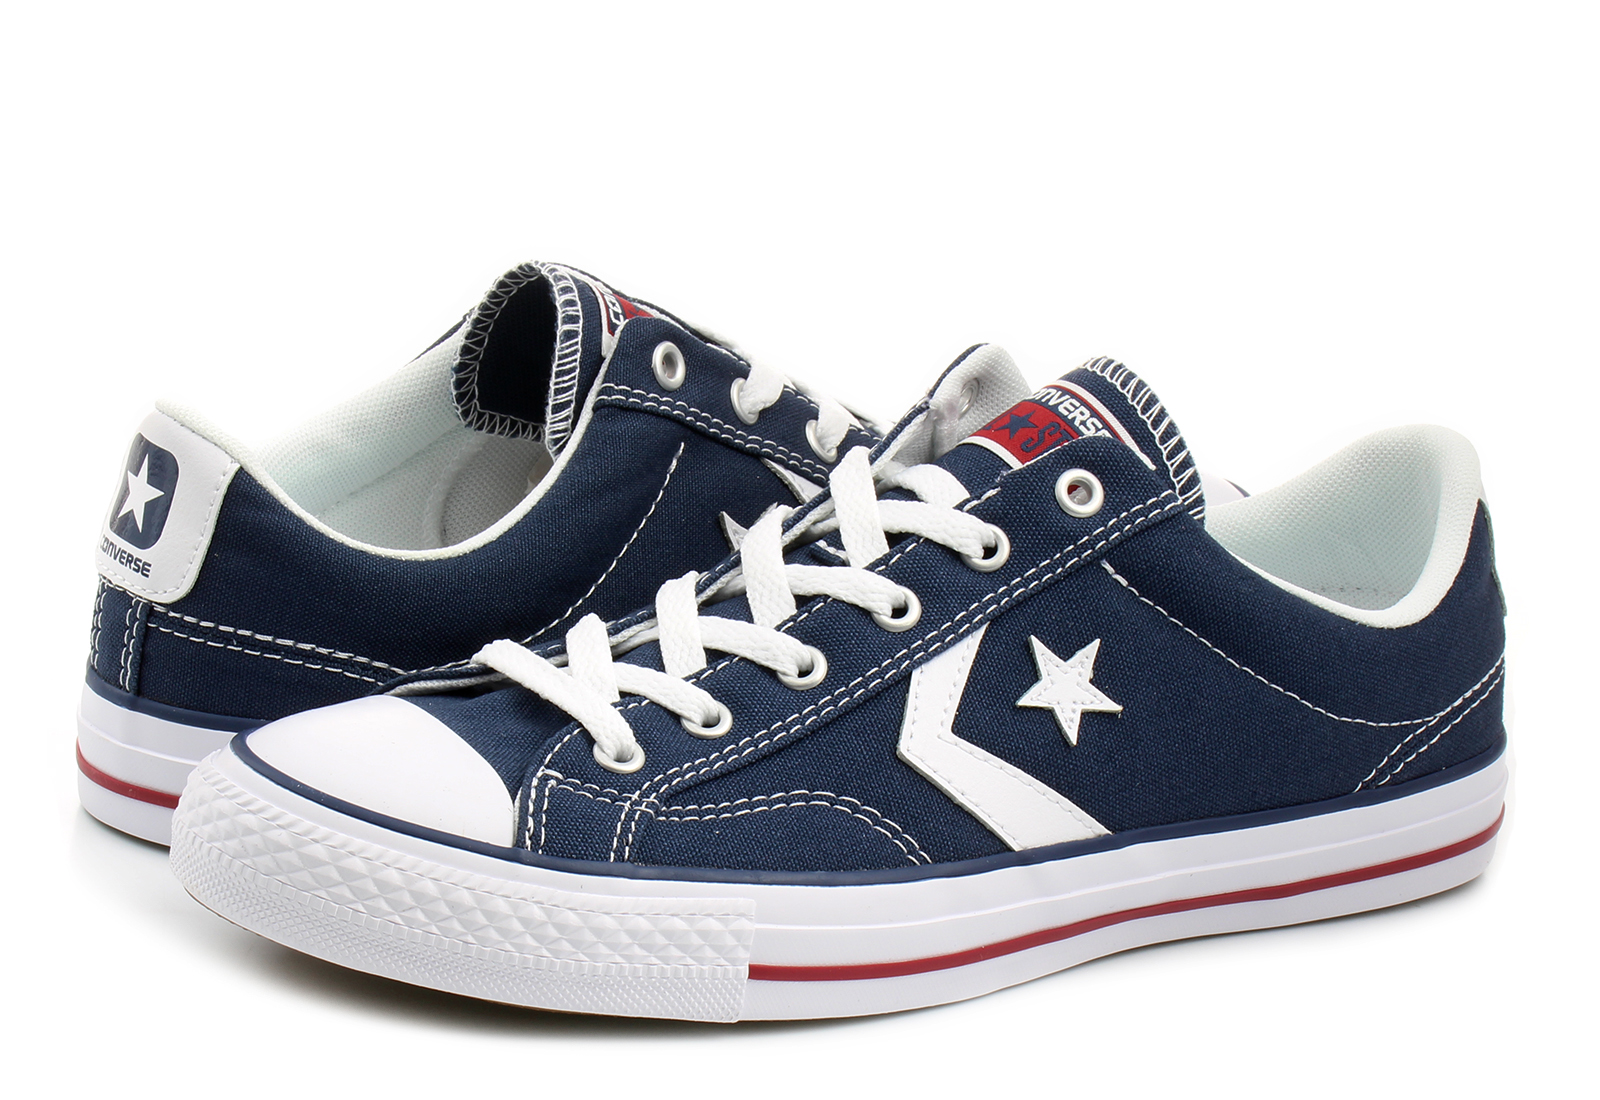 Womens boots fashion footwear online 35